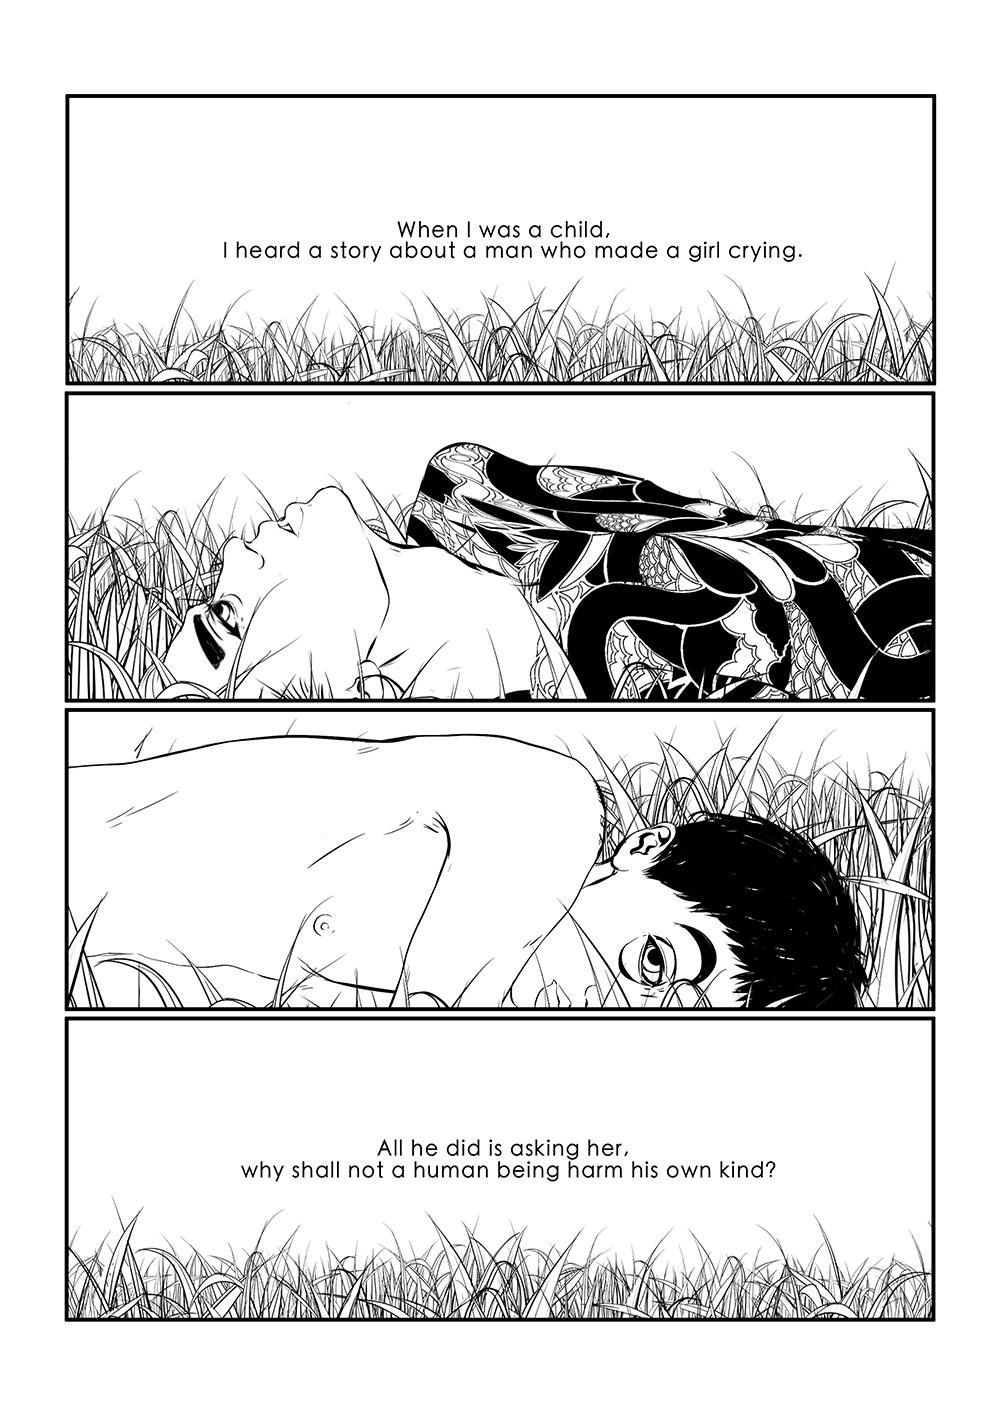 mojowang_illustration_betweenrivers_24_12.jpg